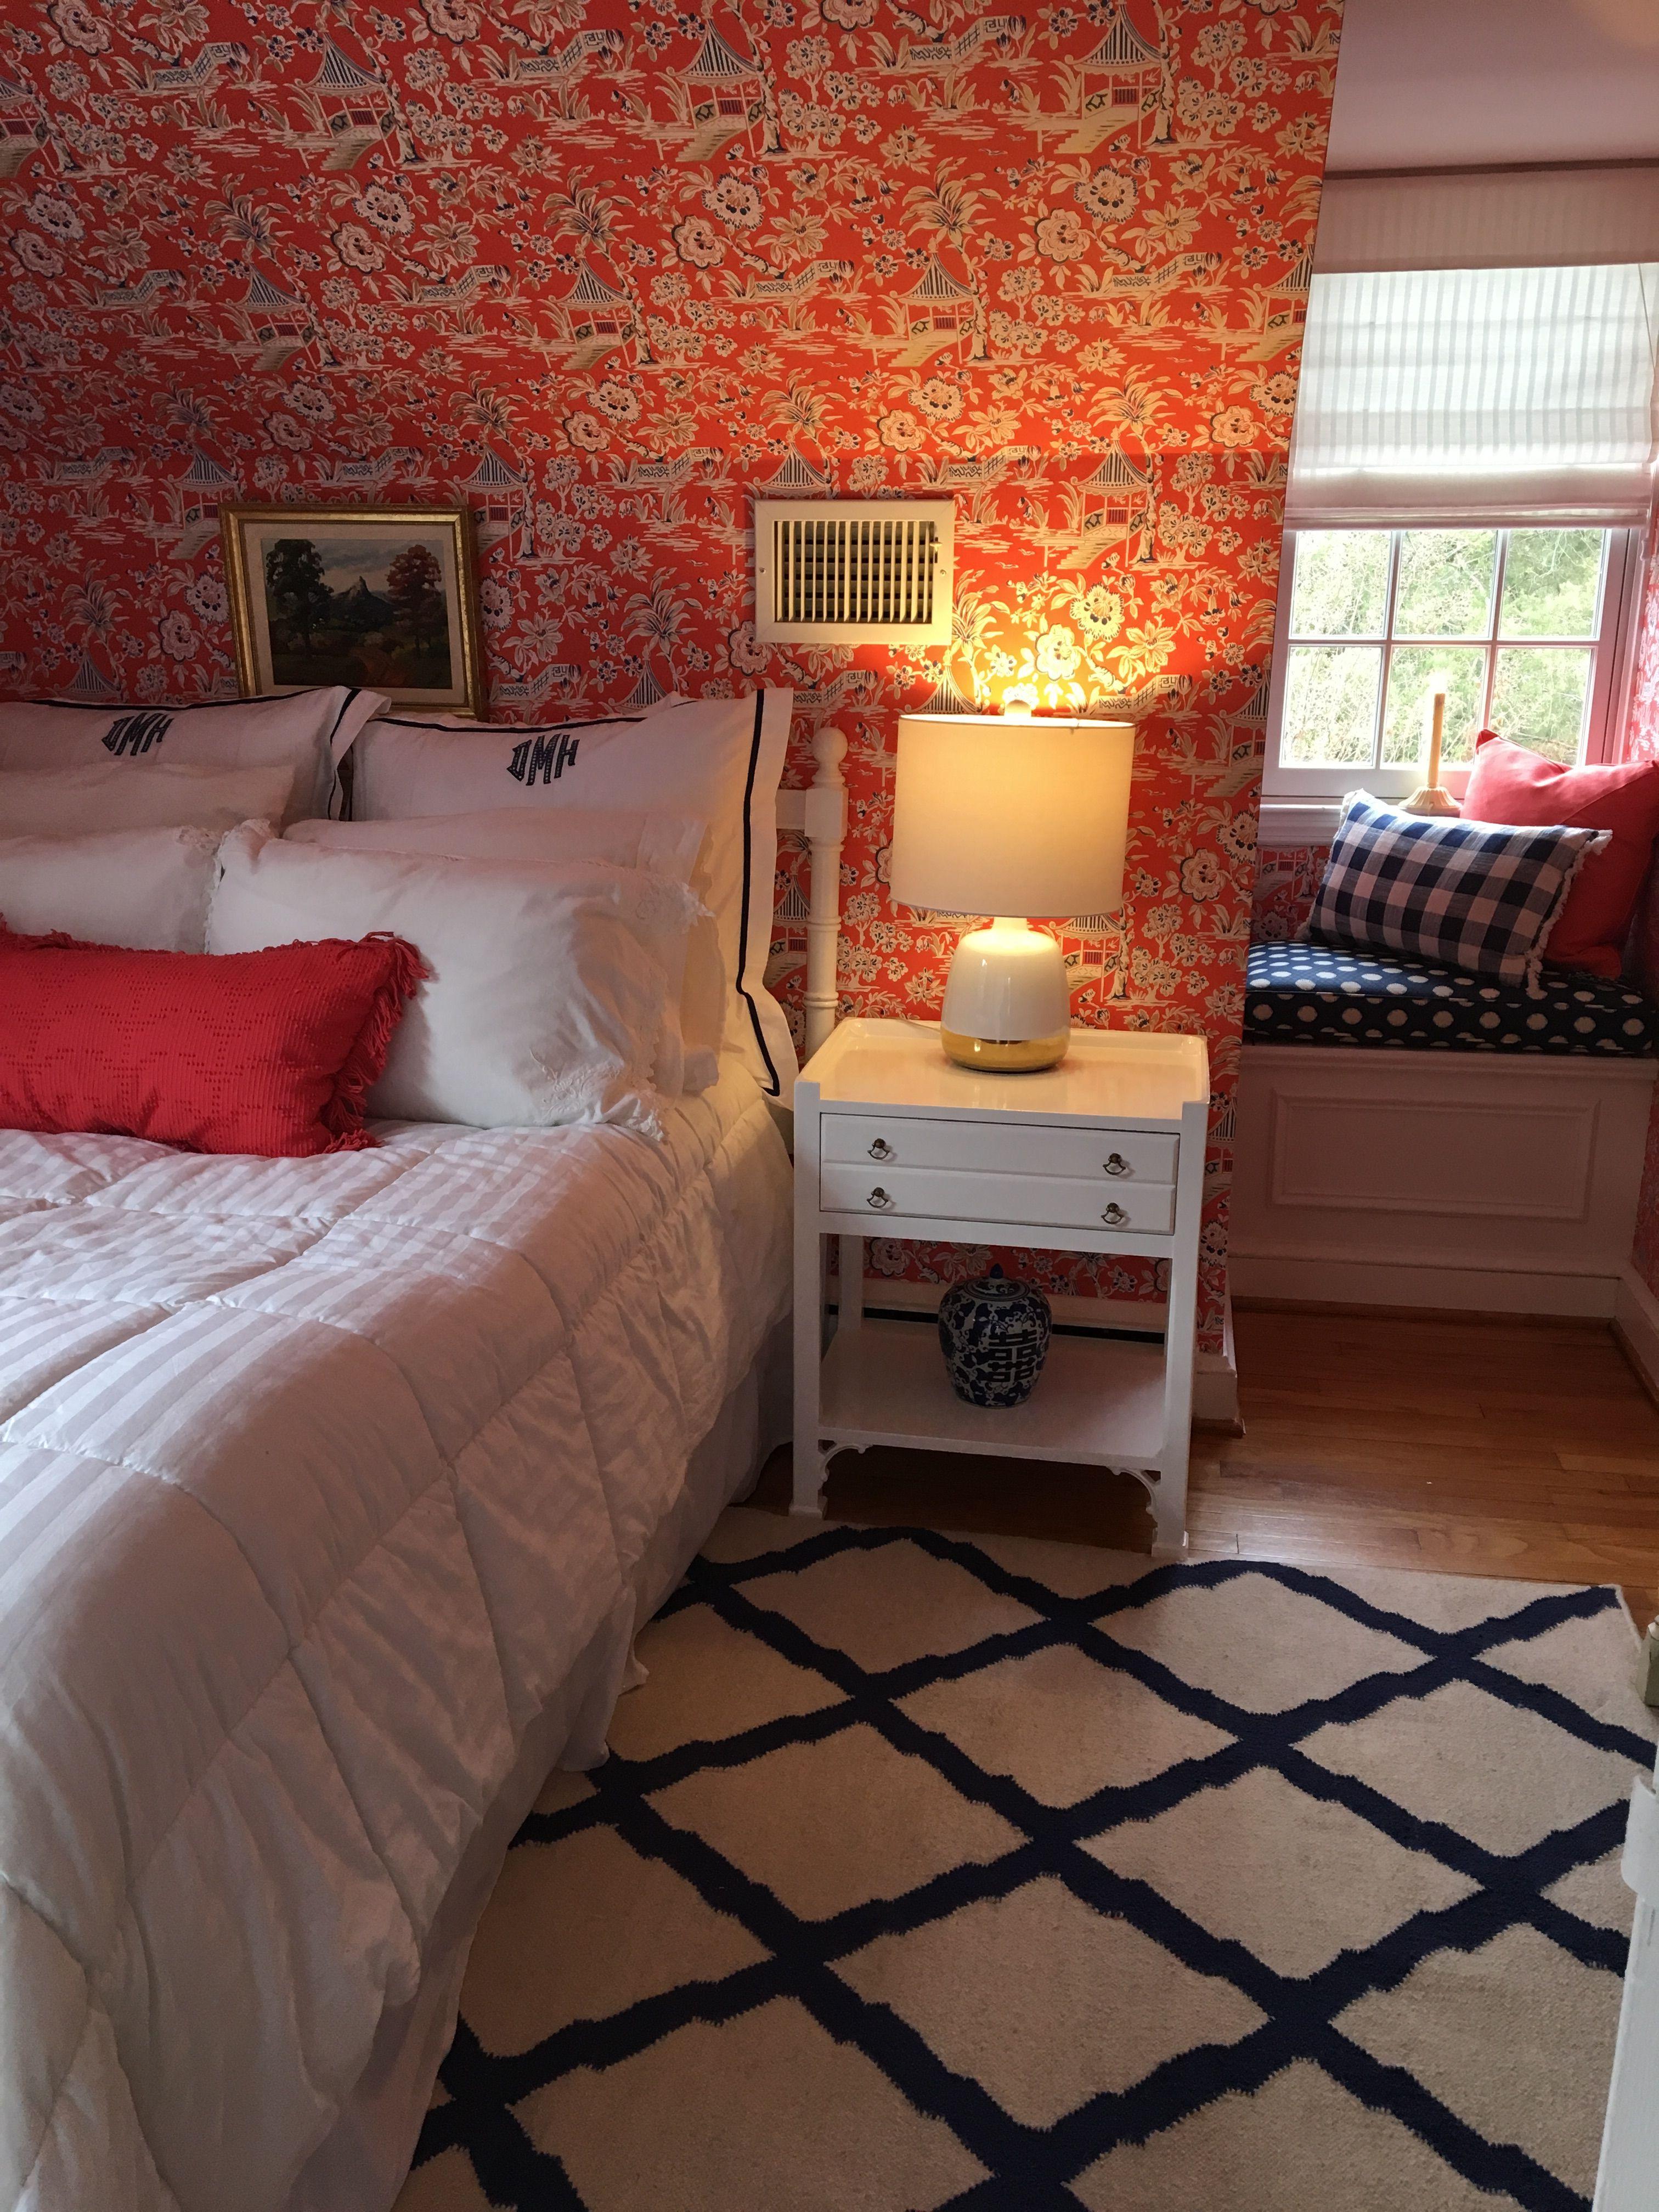 Pin by Dottie Mooney on sleep tight Bedroom inspirations